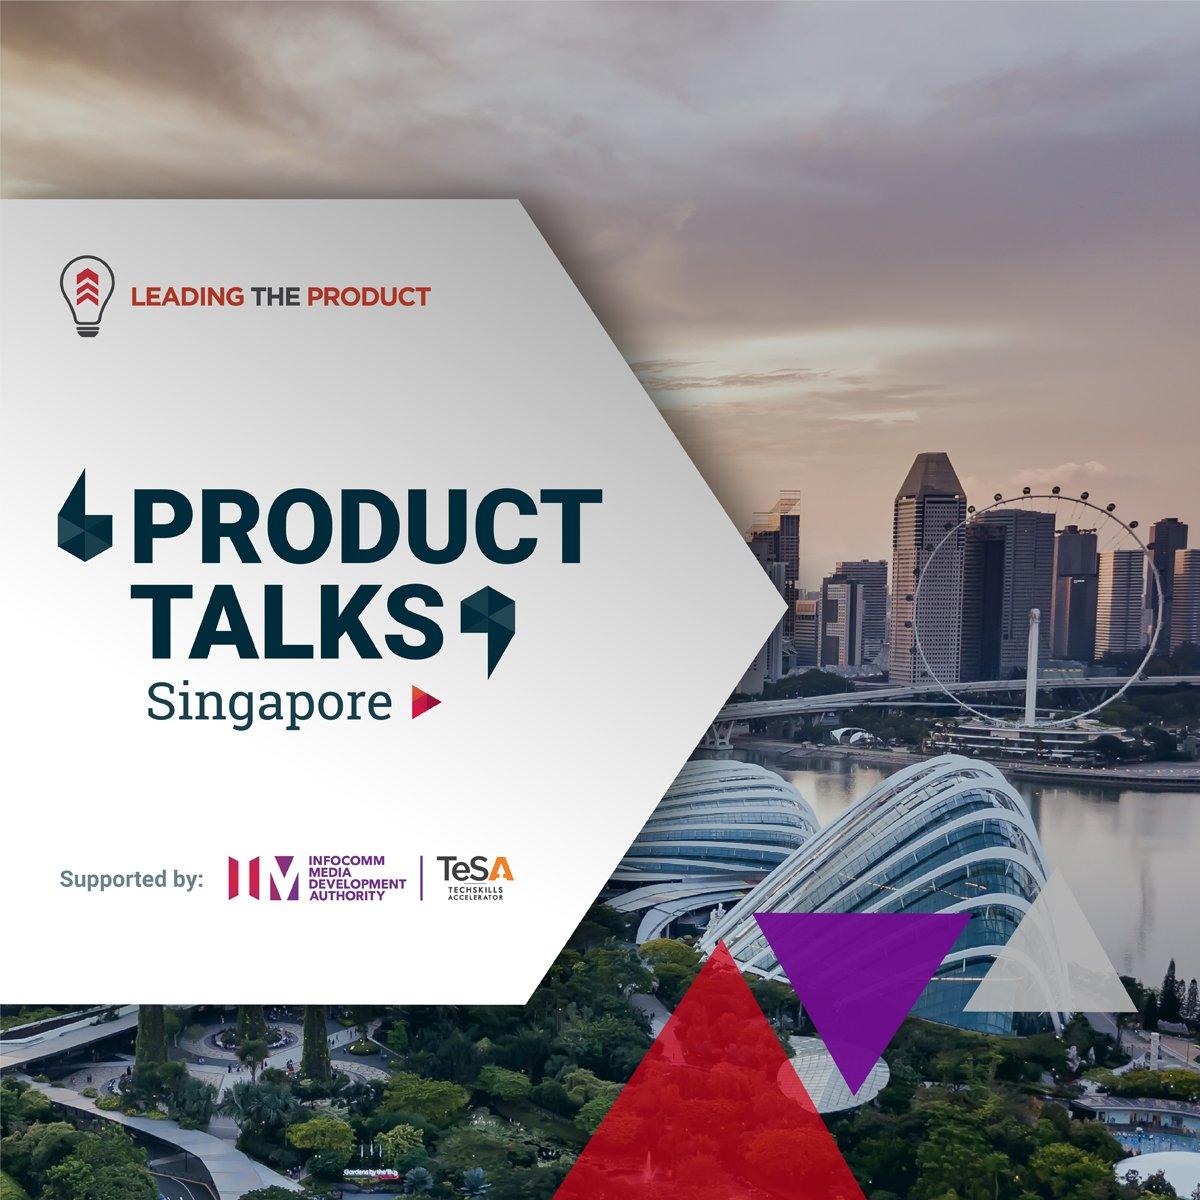 introduce product talks Singapore